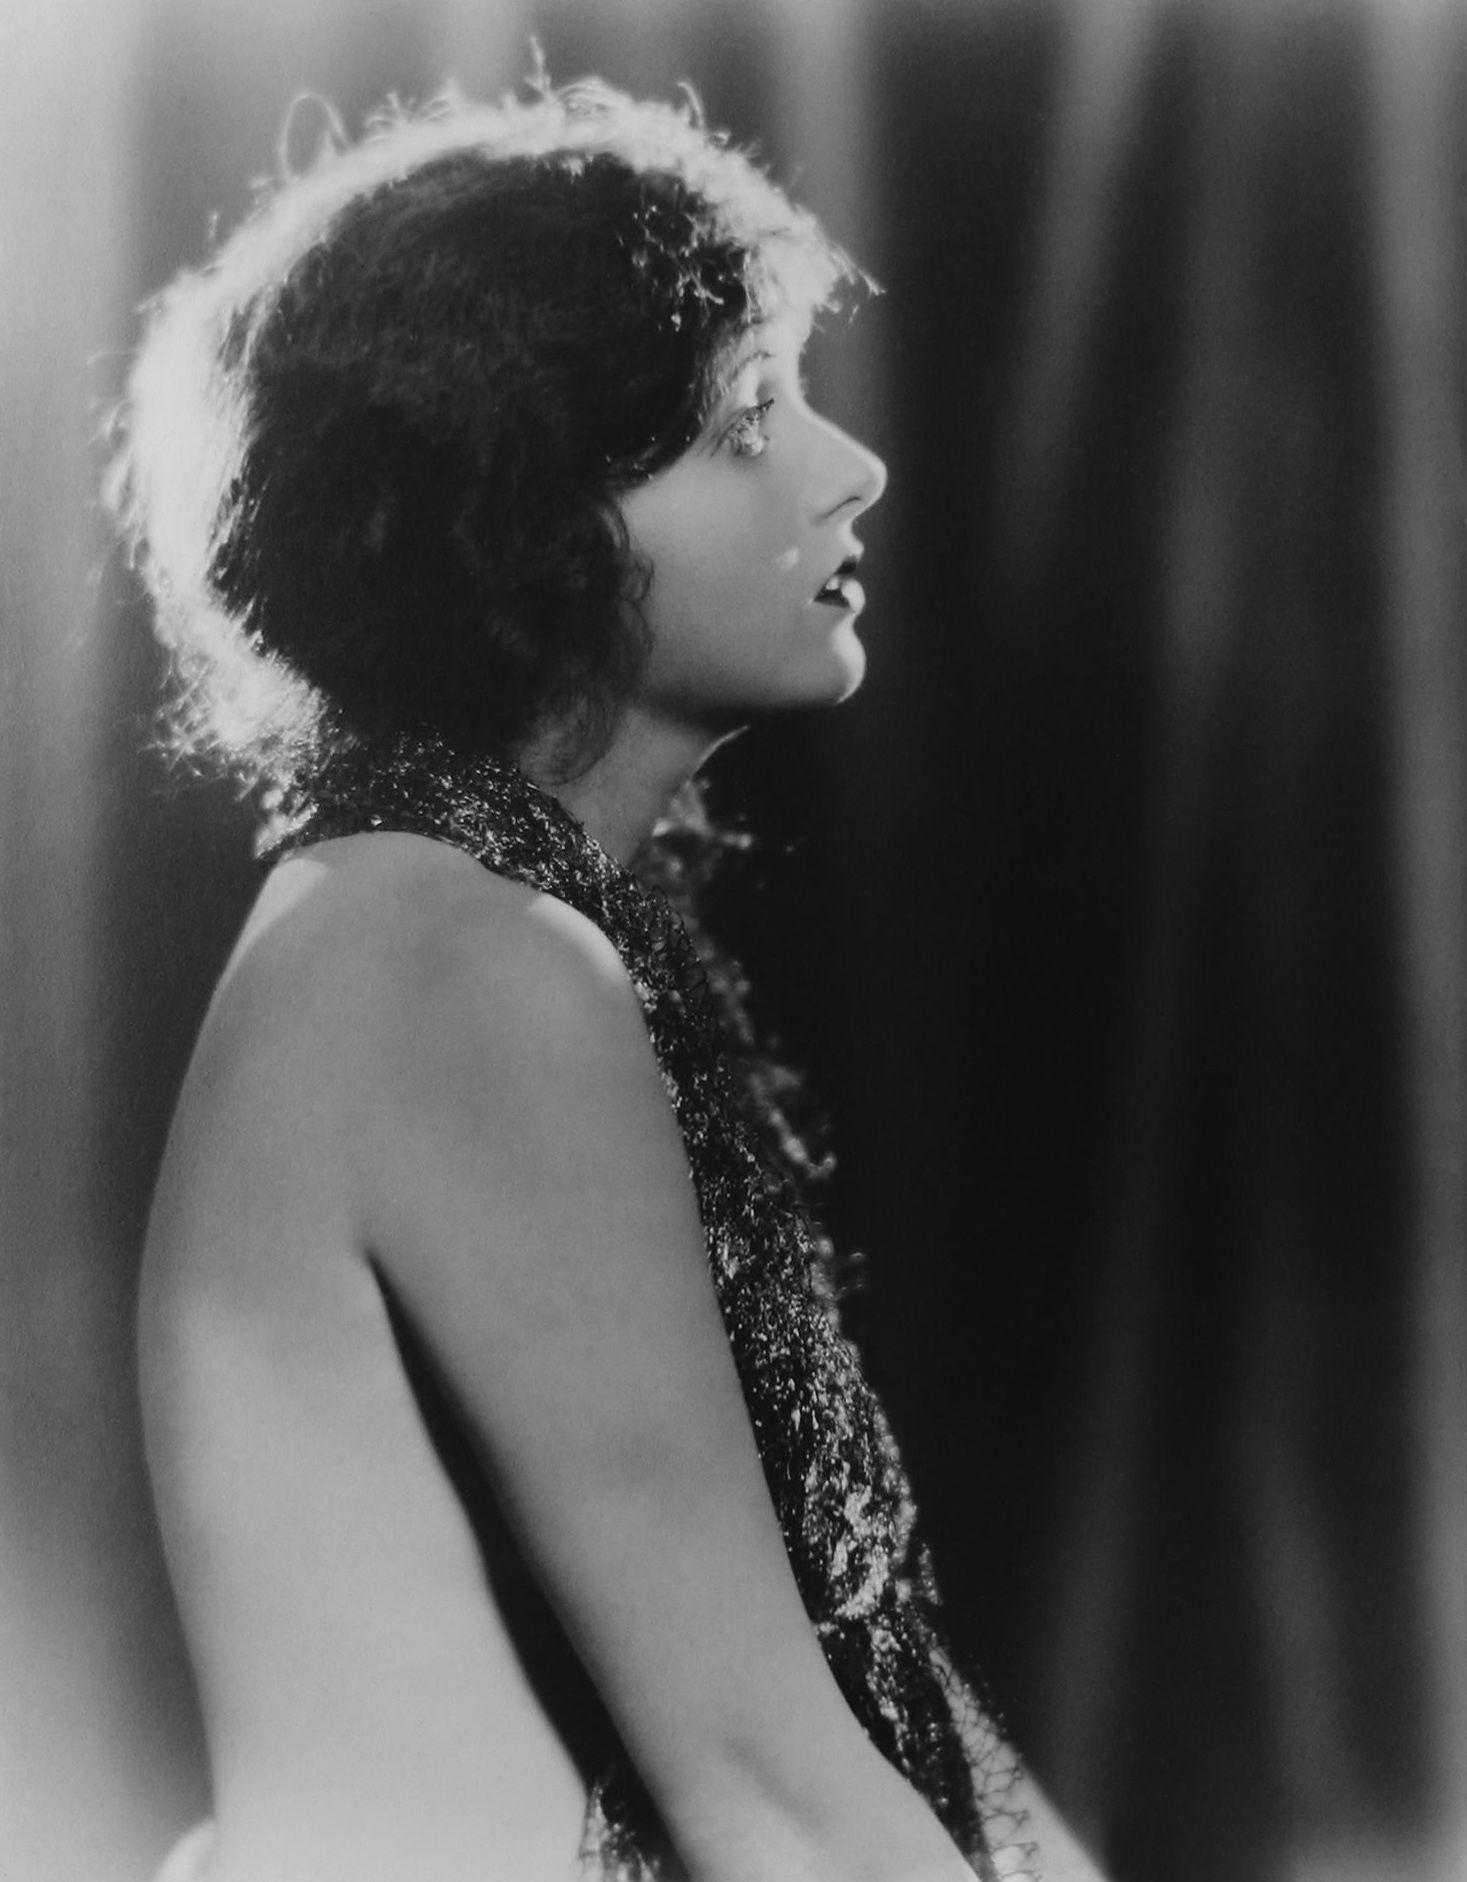 Pin by Carlo Fiore on Opera posters | Ziegfeld girls